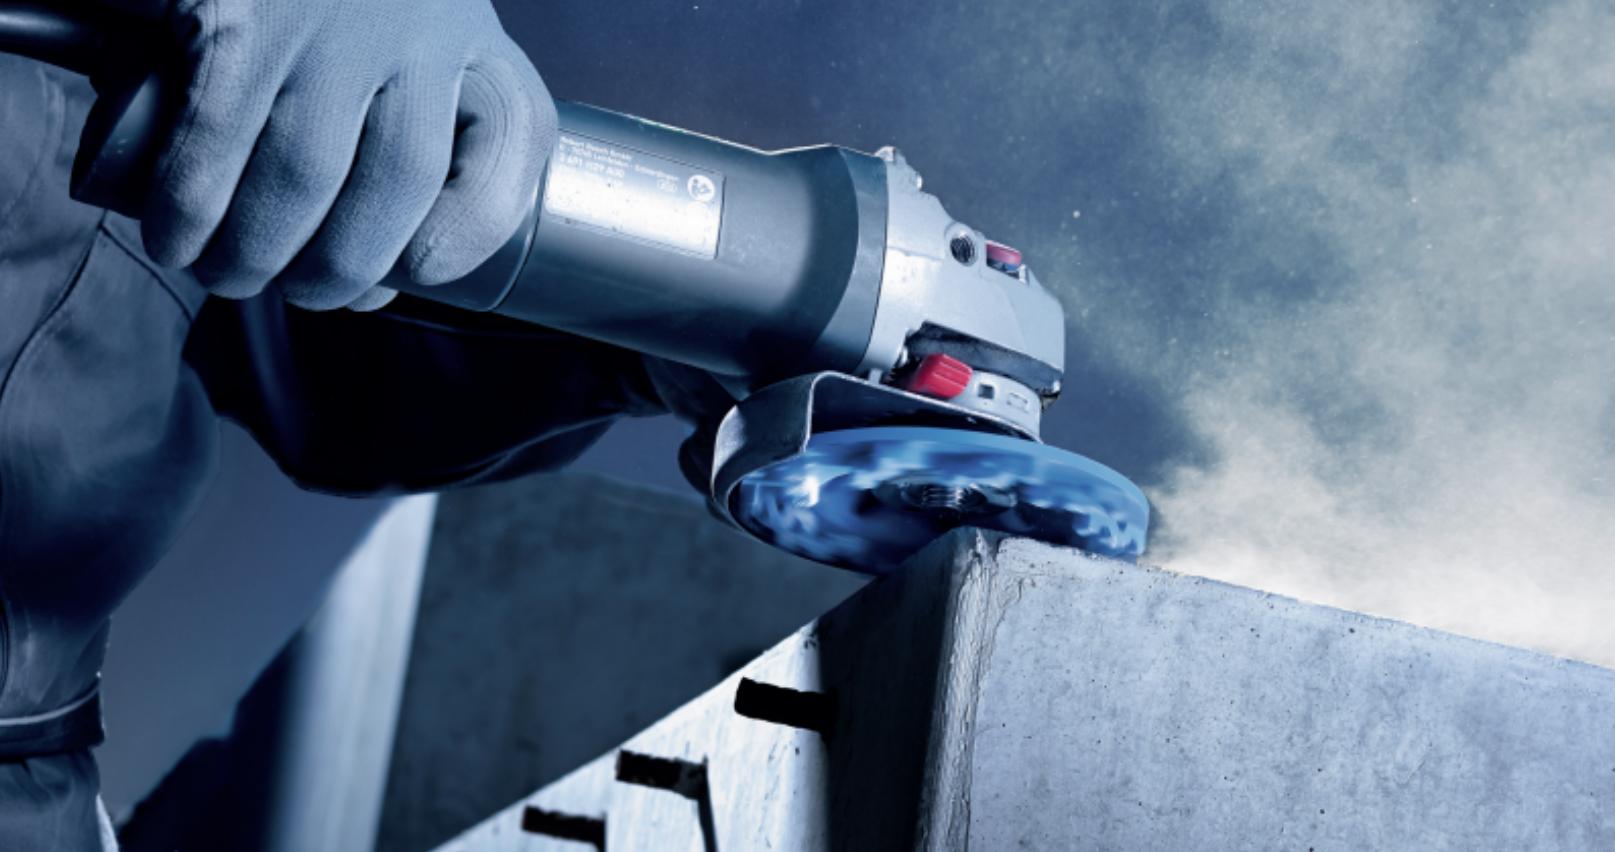 Tyrolit Abrasives - Moving Technology. Inspiring Life.